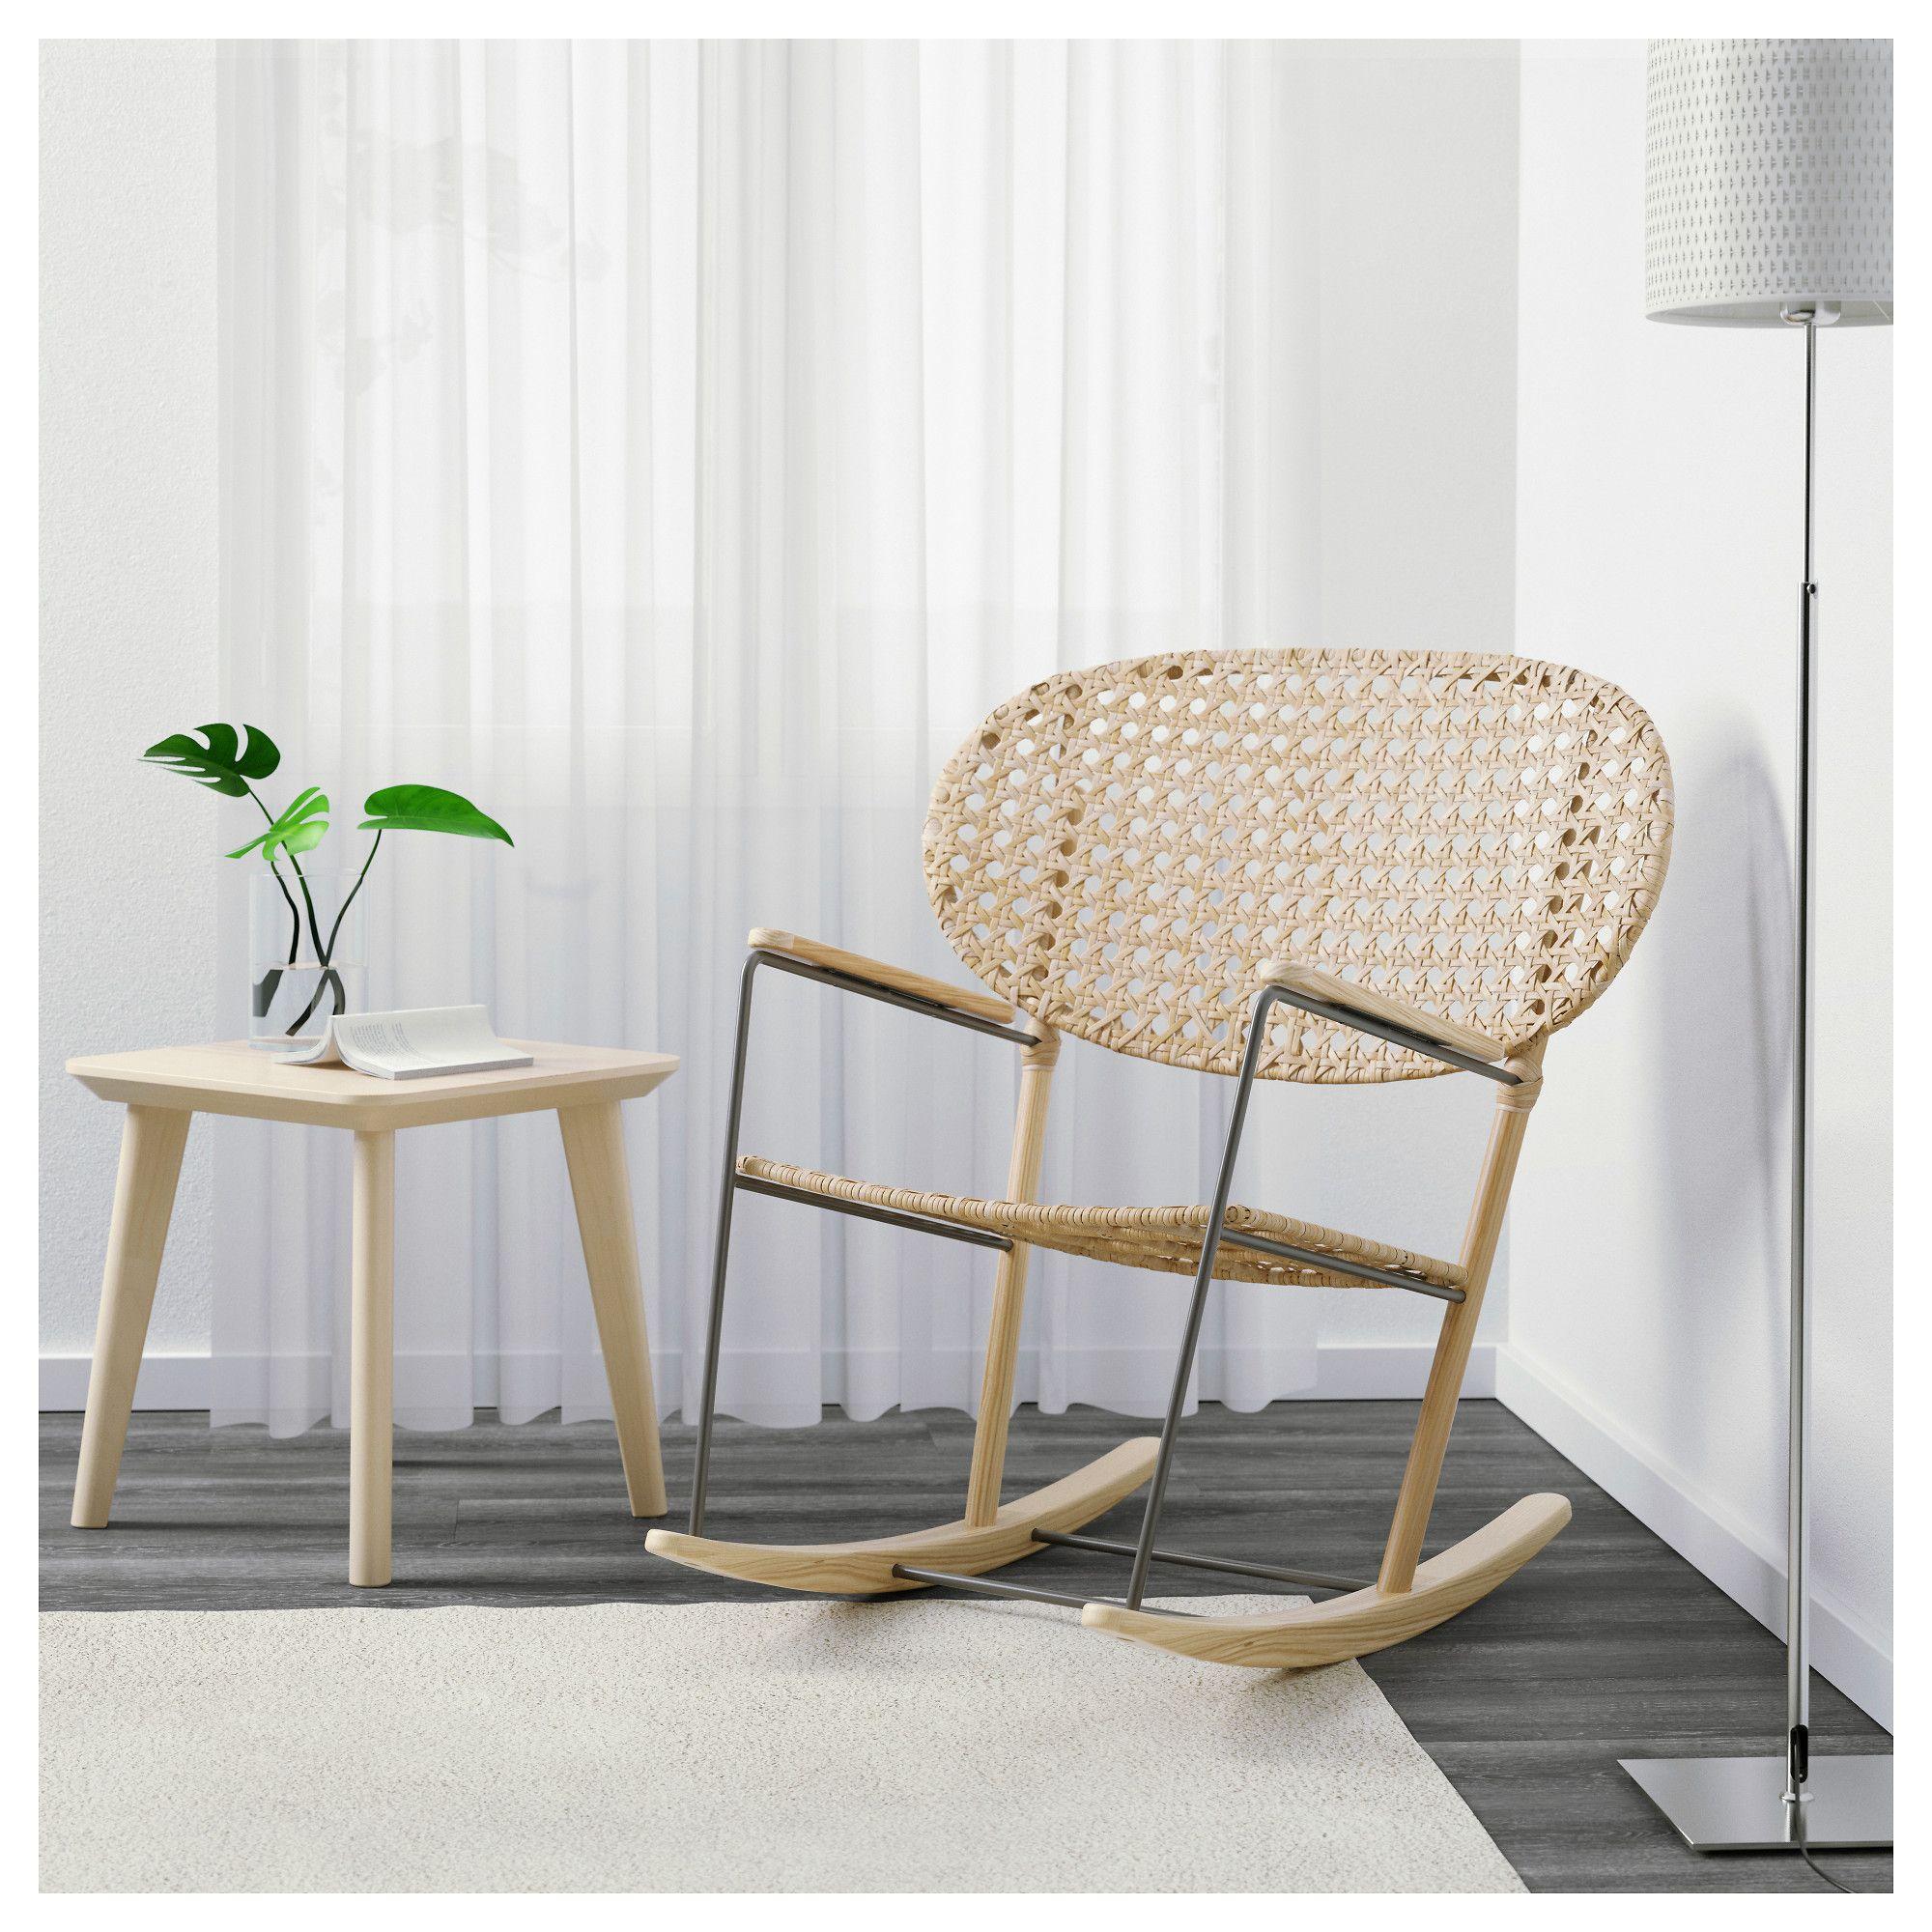 GR–NADAL Rocking chair Grey natural